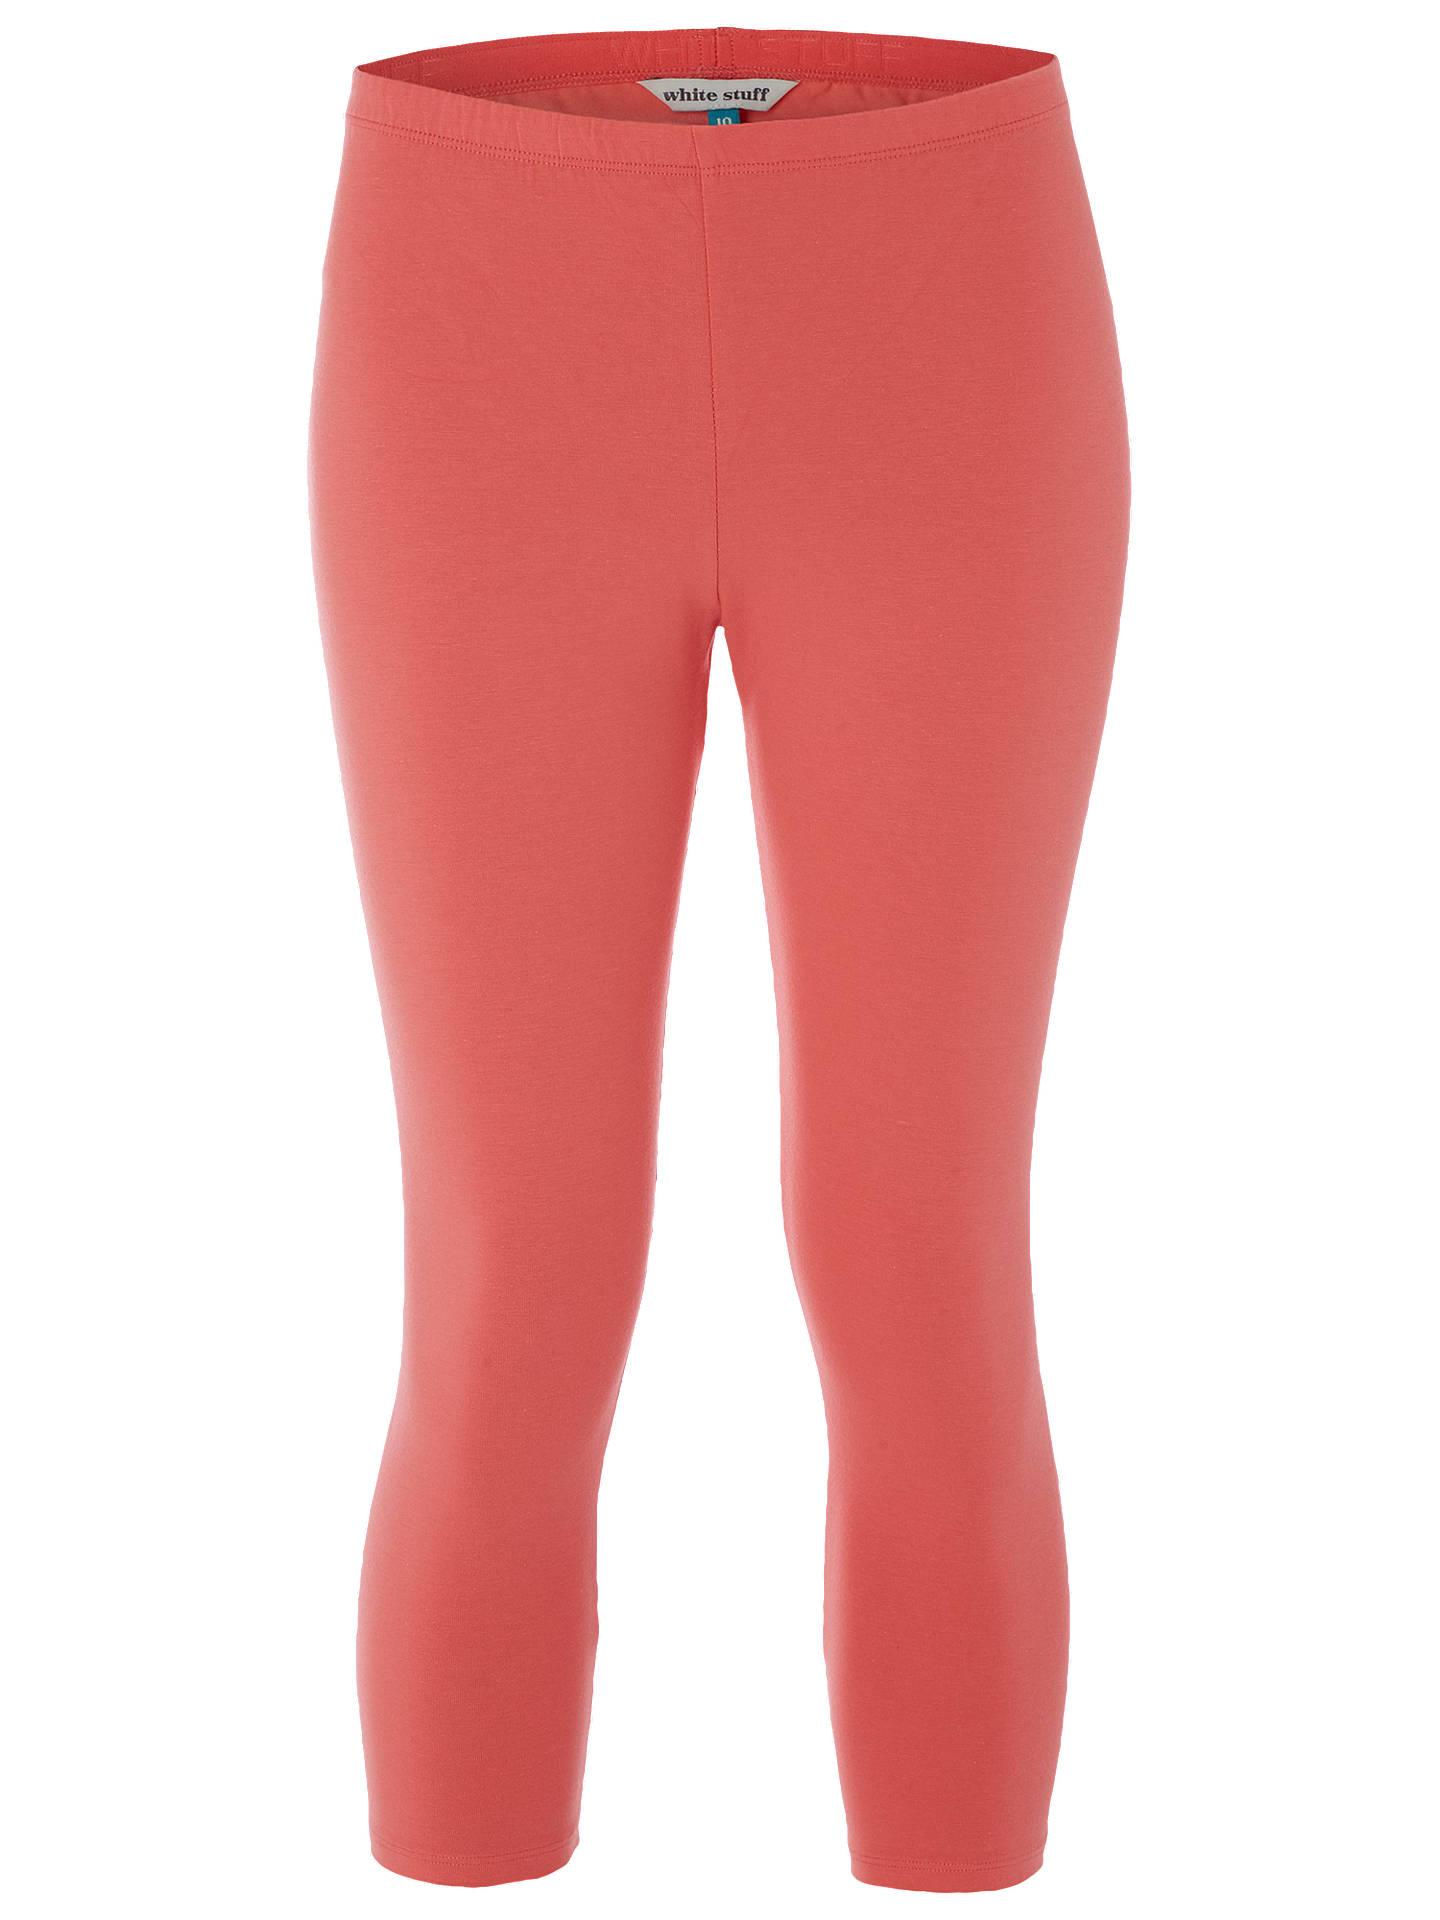 bb2481a642bce4 Buy White Stuff Jumping Lil Cropped Leggings, Coral Orange, 6 Online at  johnlewis.